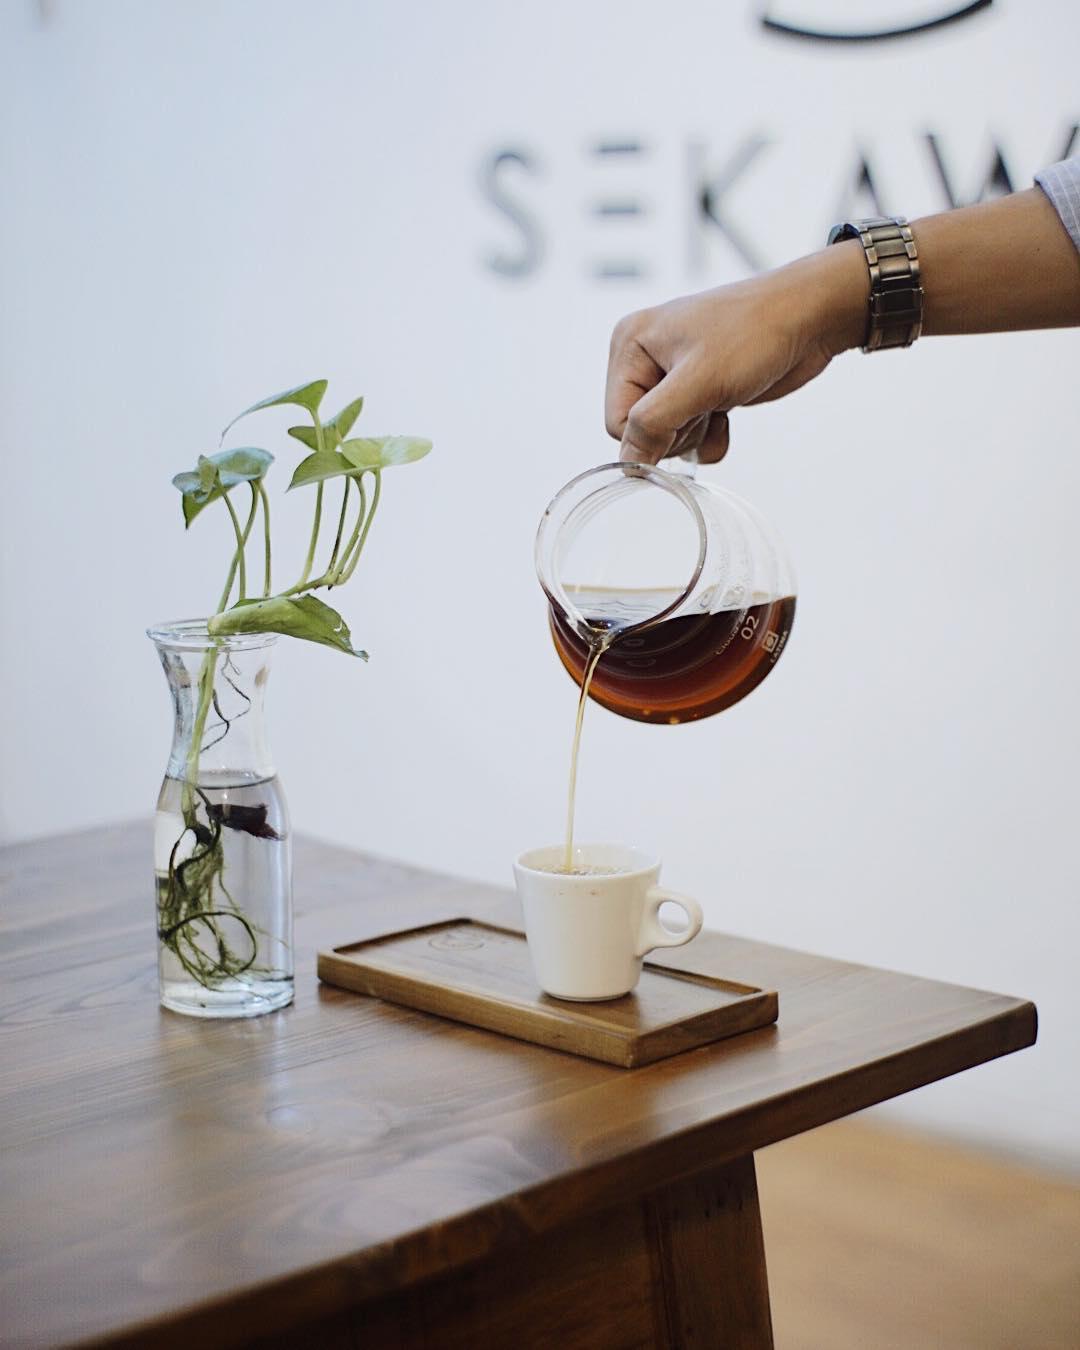 Sekawan Coffee Seturan